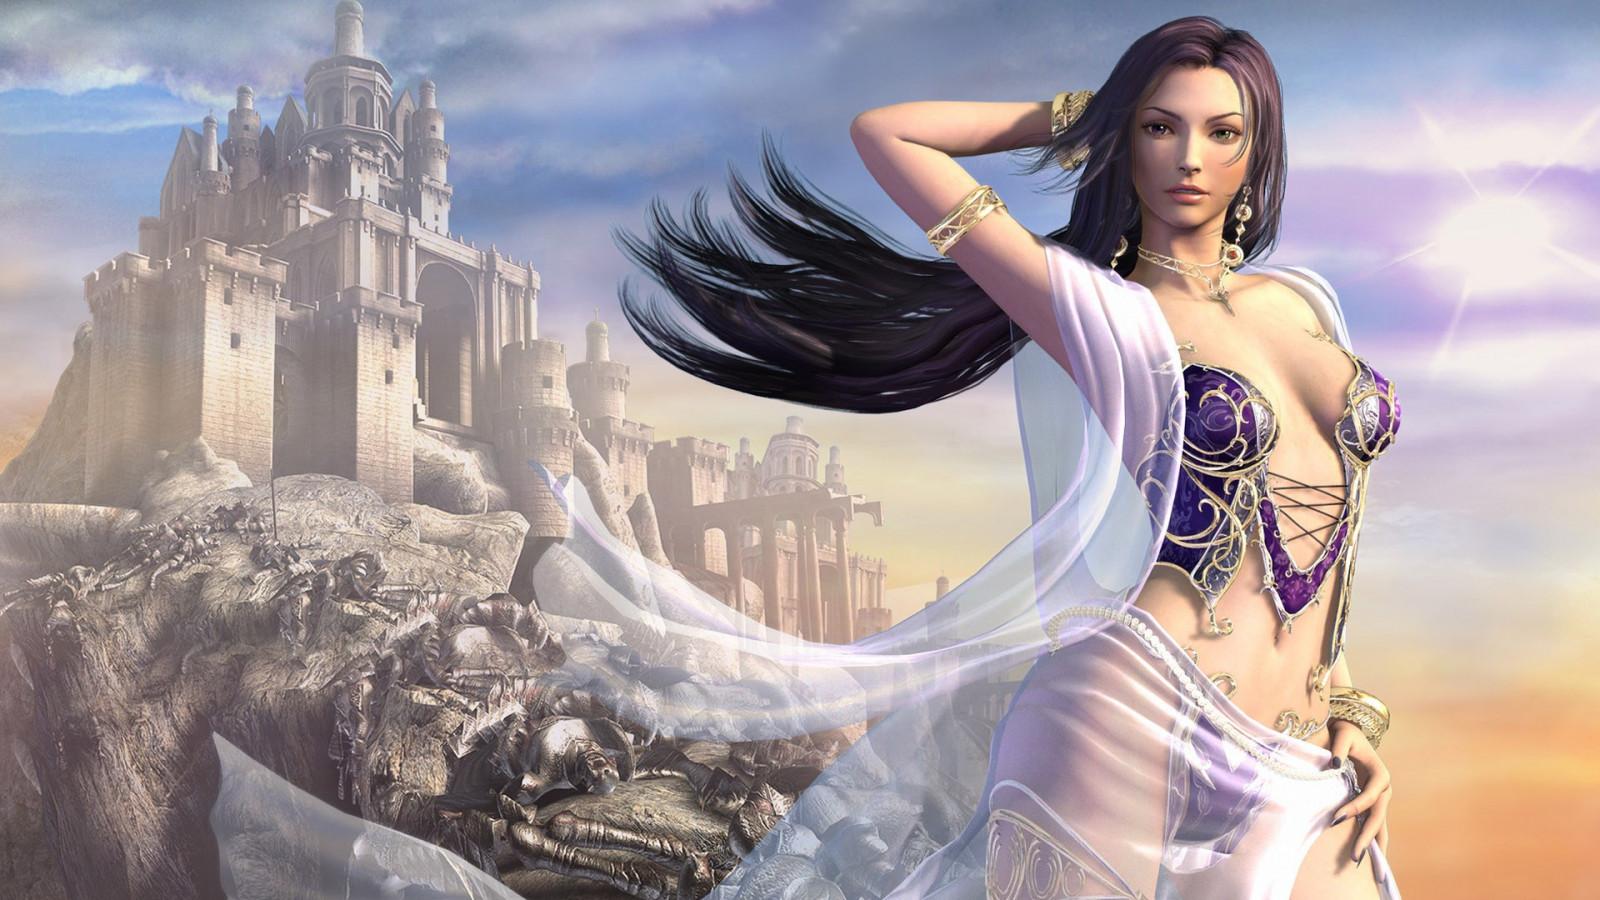 Fantasy girls pics #10